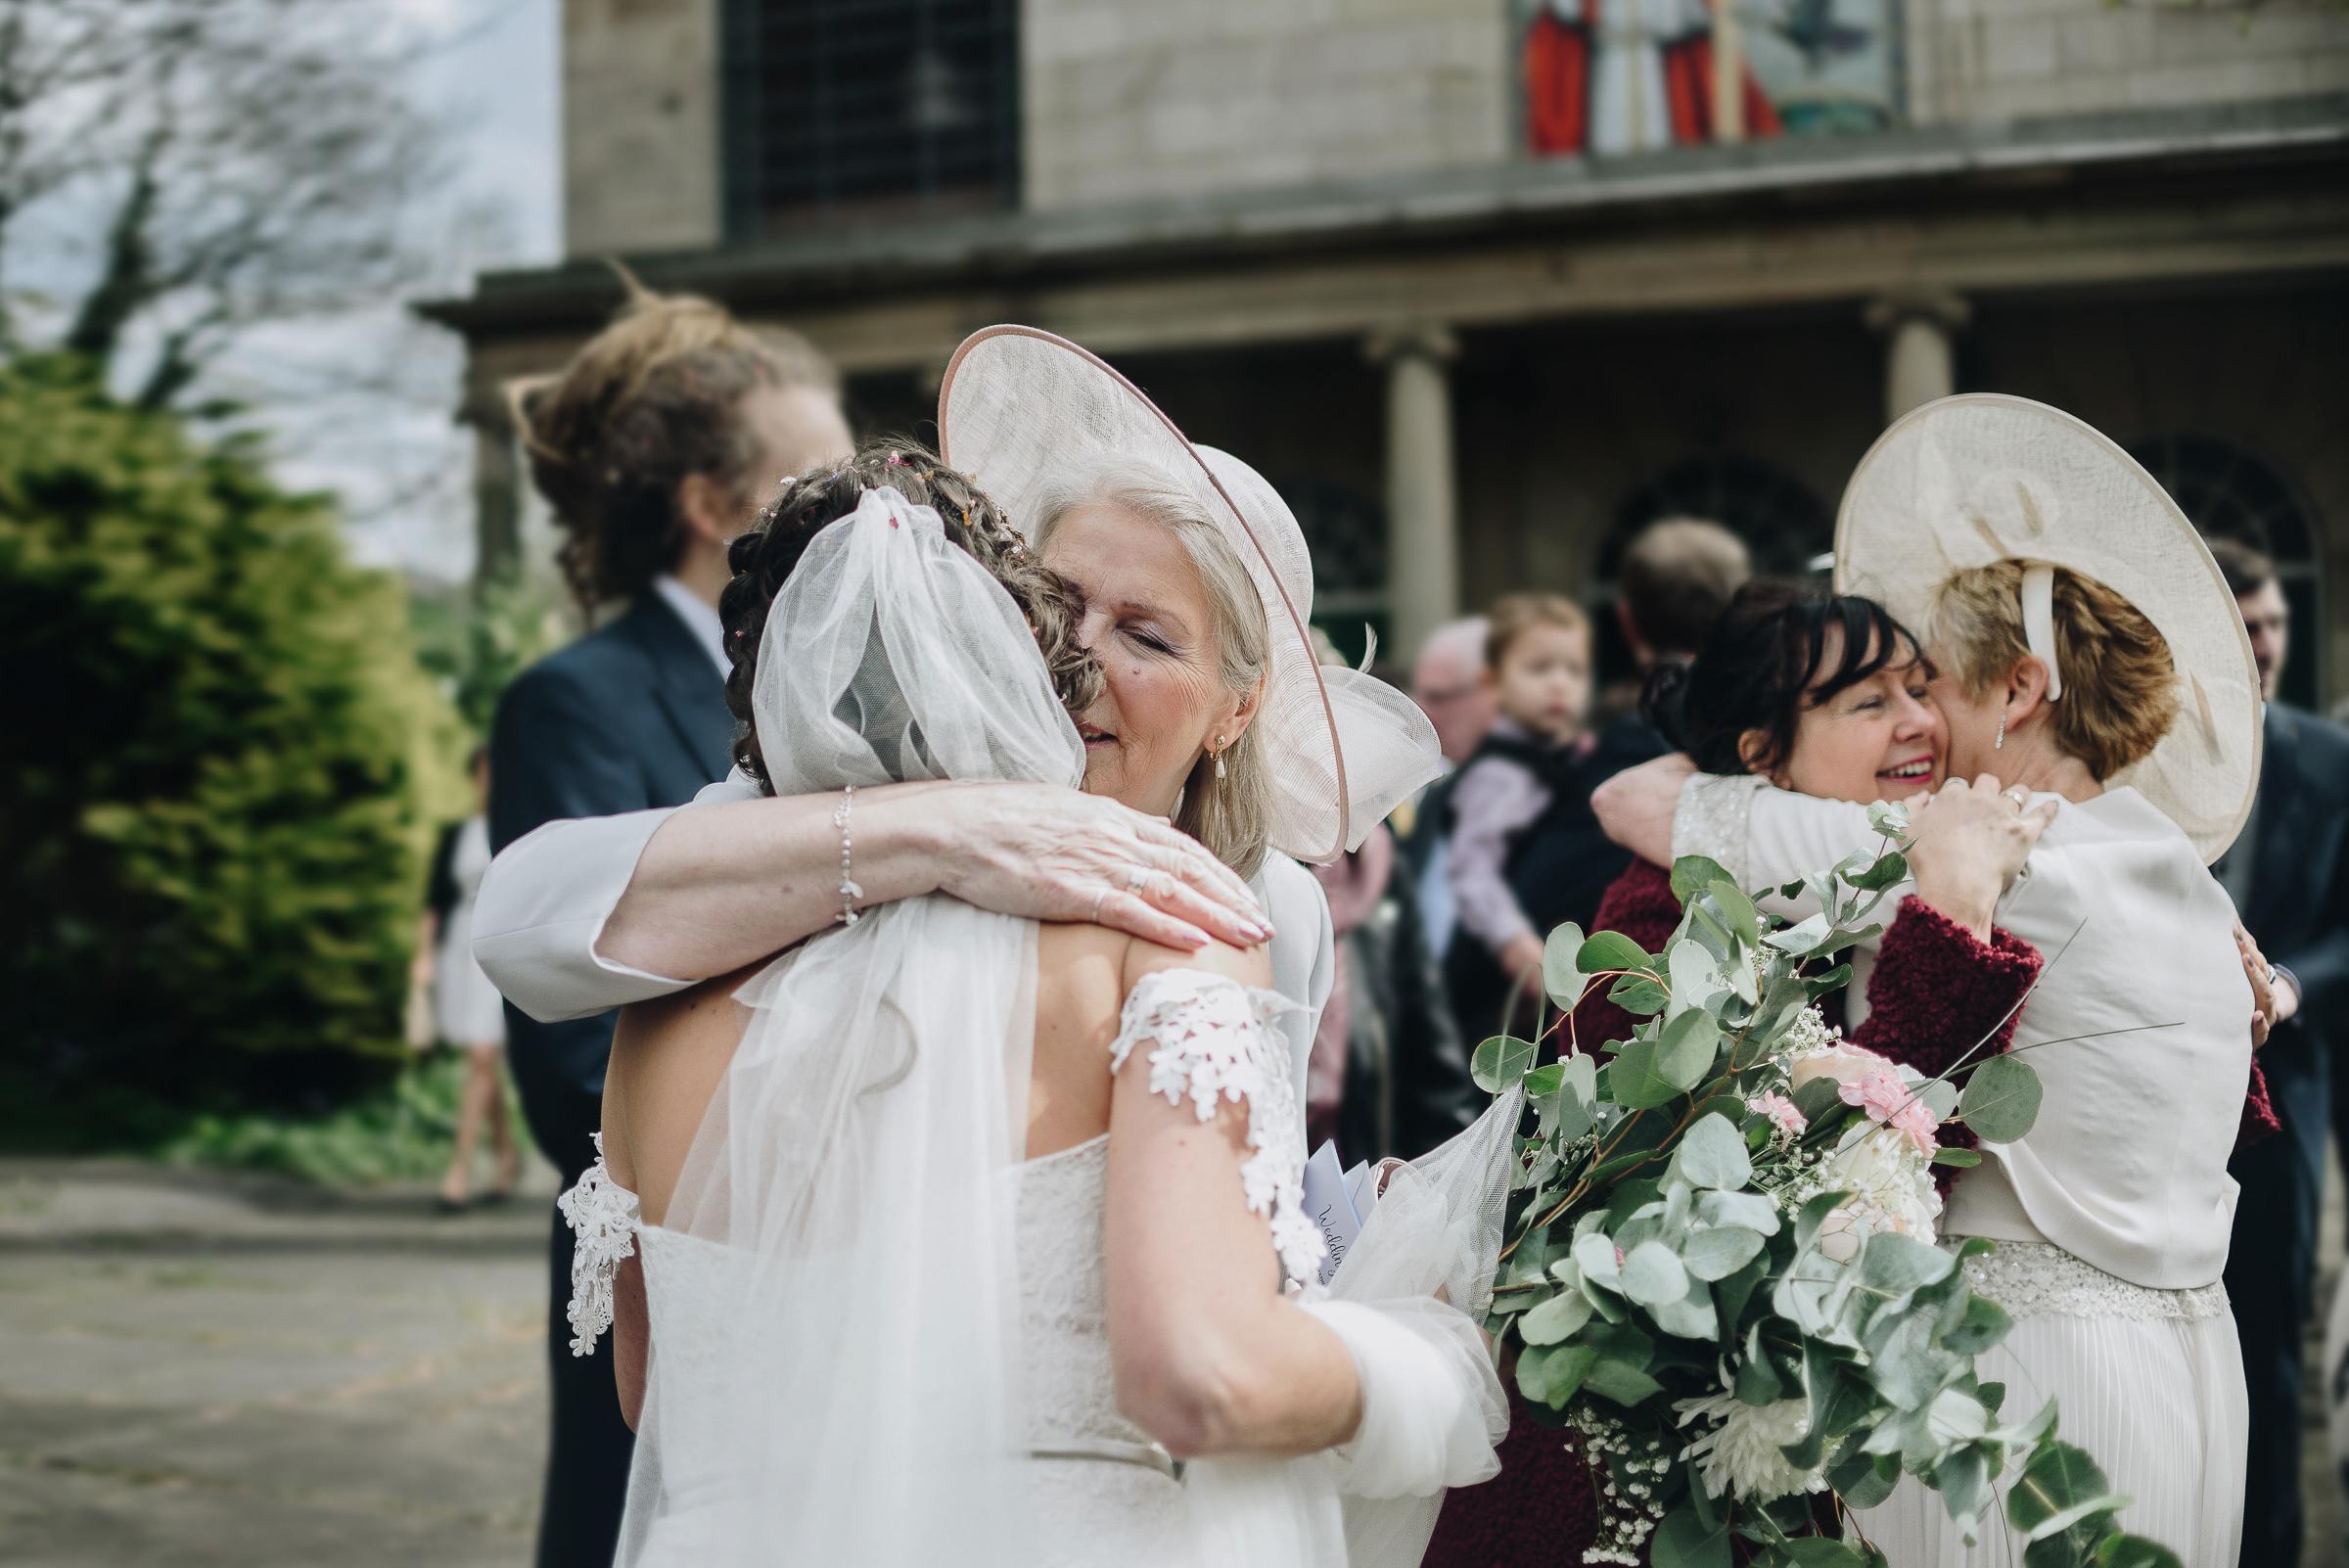 Rochdale-town-hall-vegan-harry-potter-wedding-photography-24.jpg